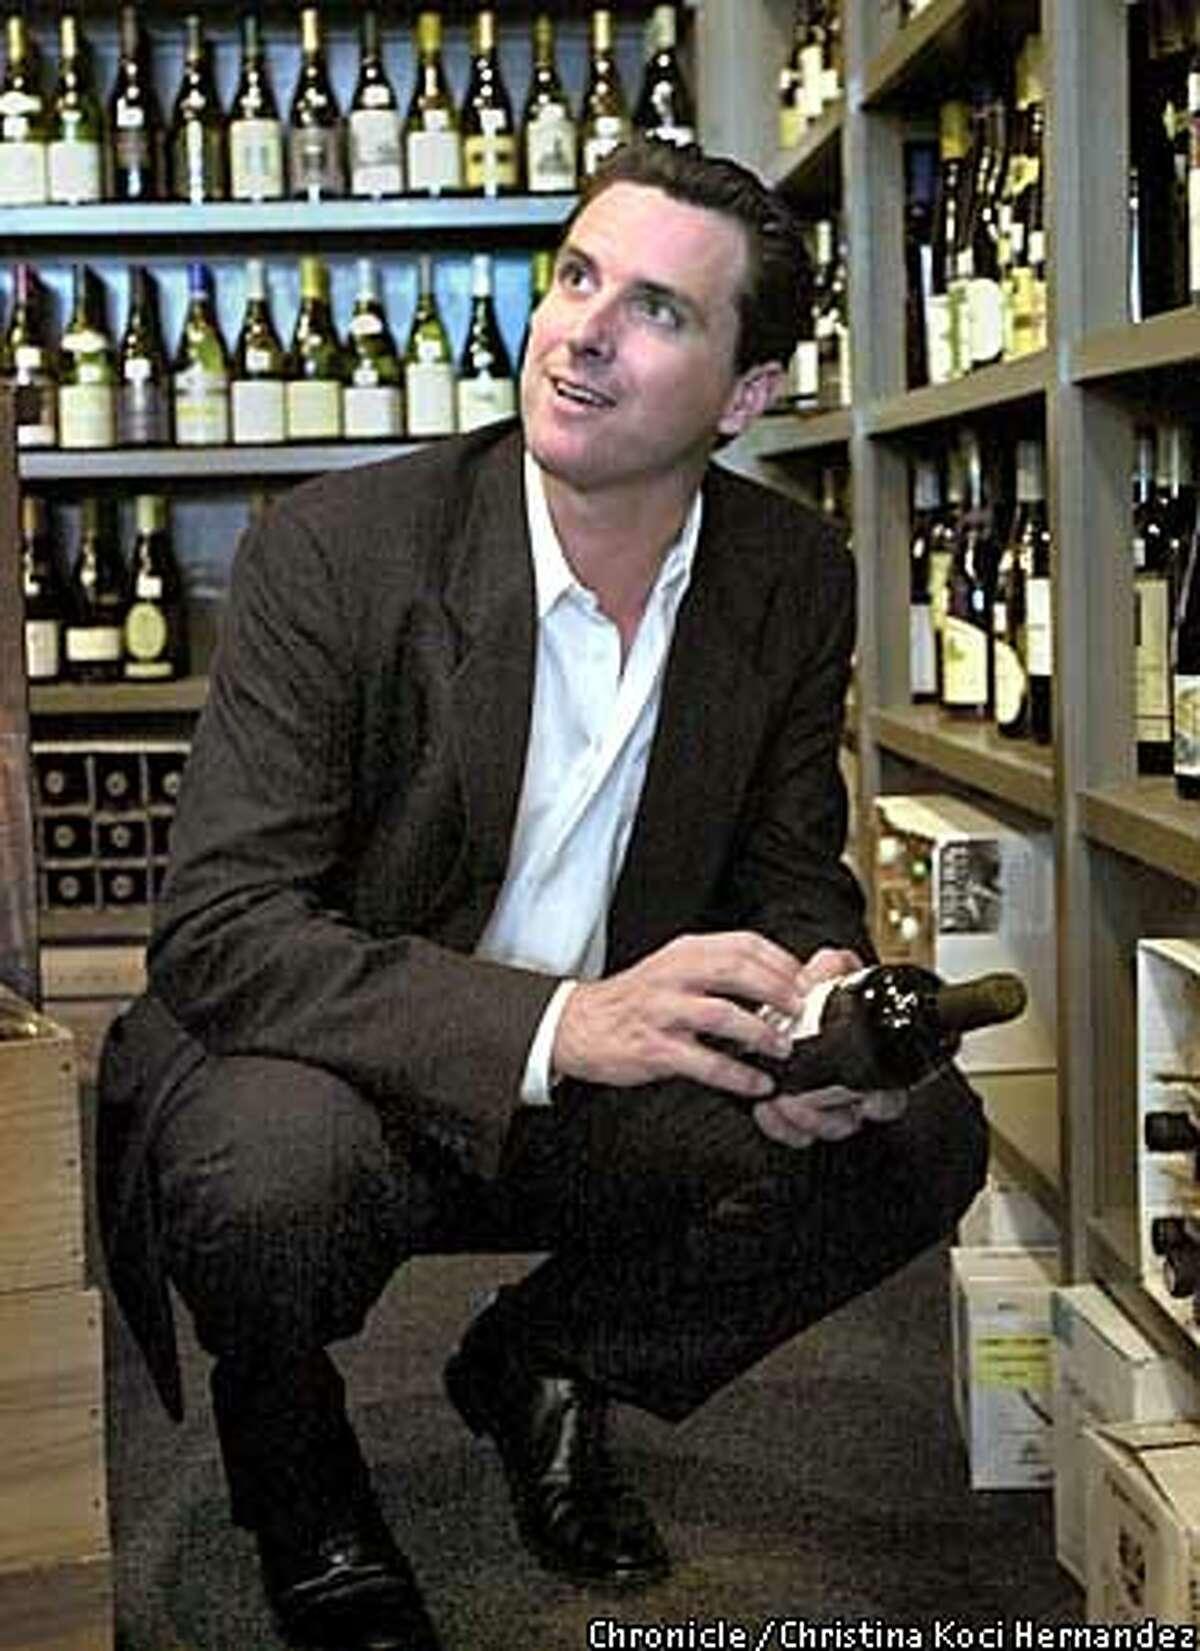 CHRISTINA KOCI HERNANDEZ/CHRONICLE Gavin Newsom at Plumpjack Wines in Noe Valley.